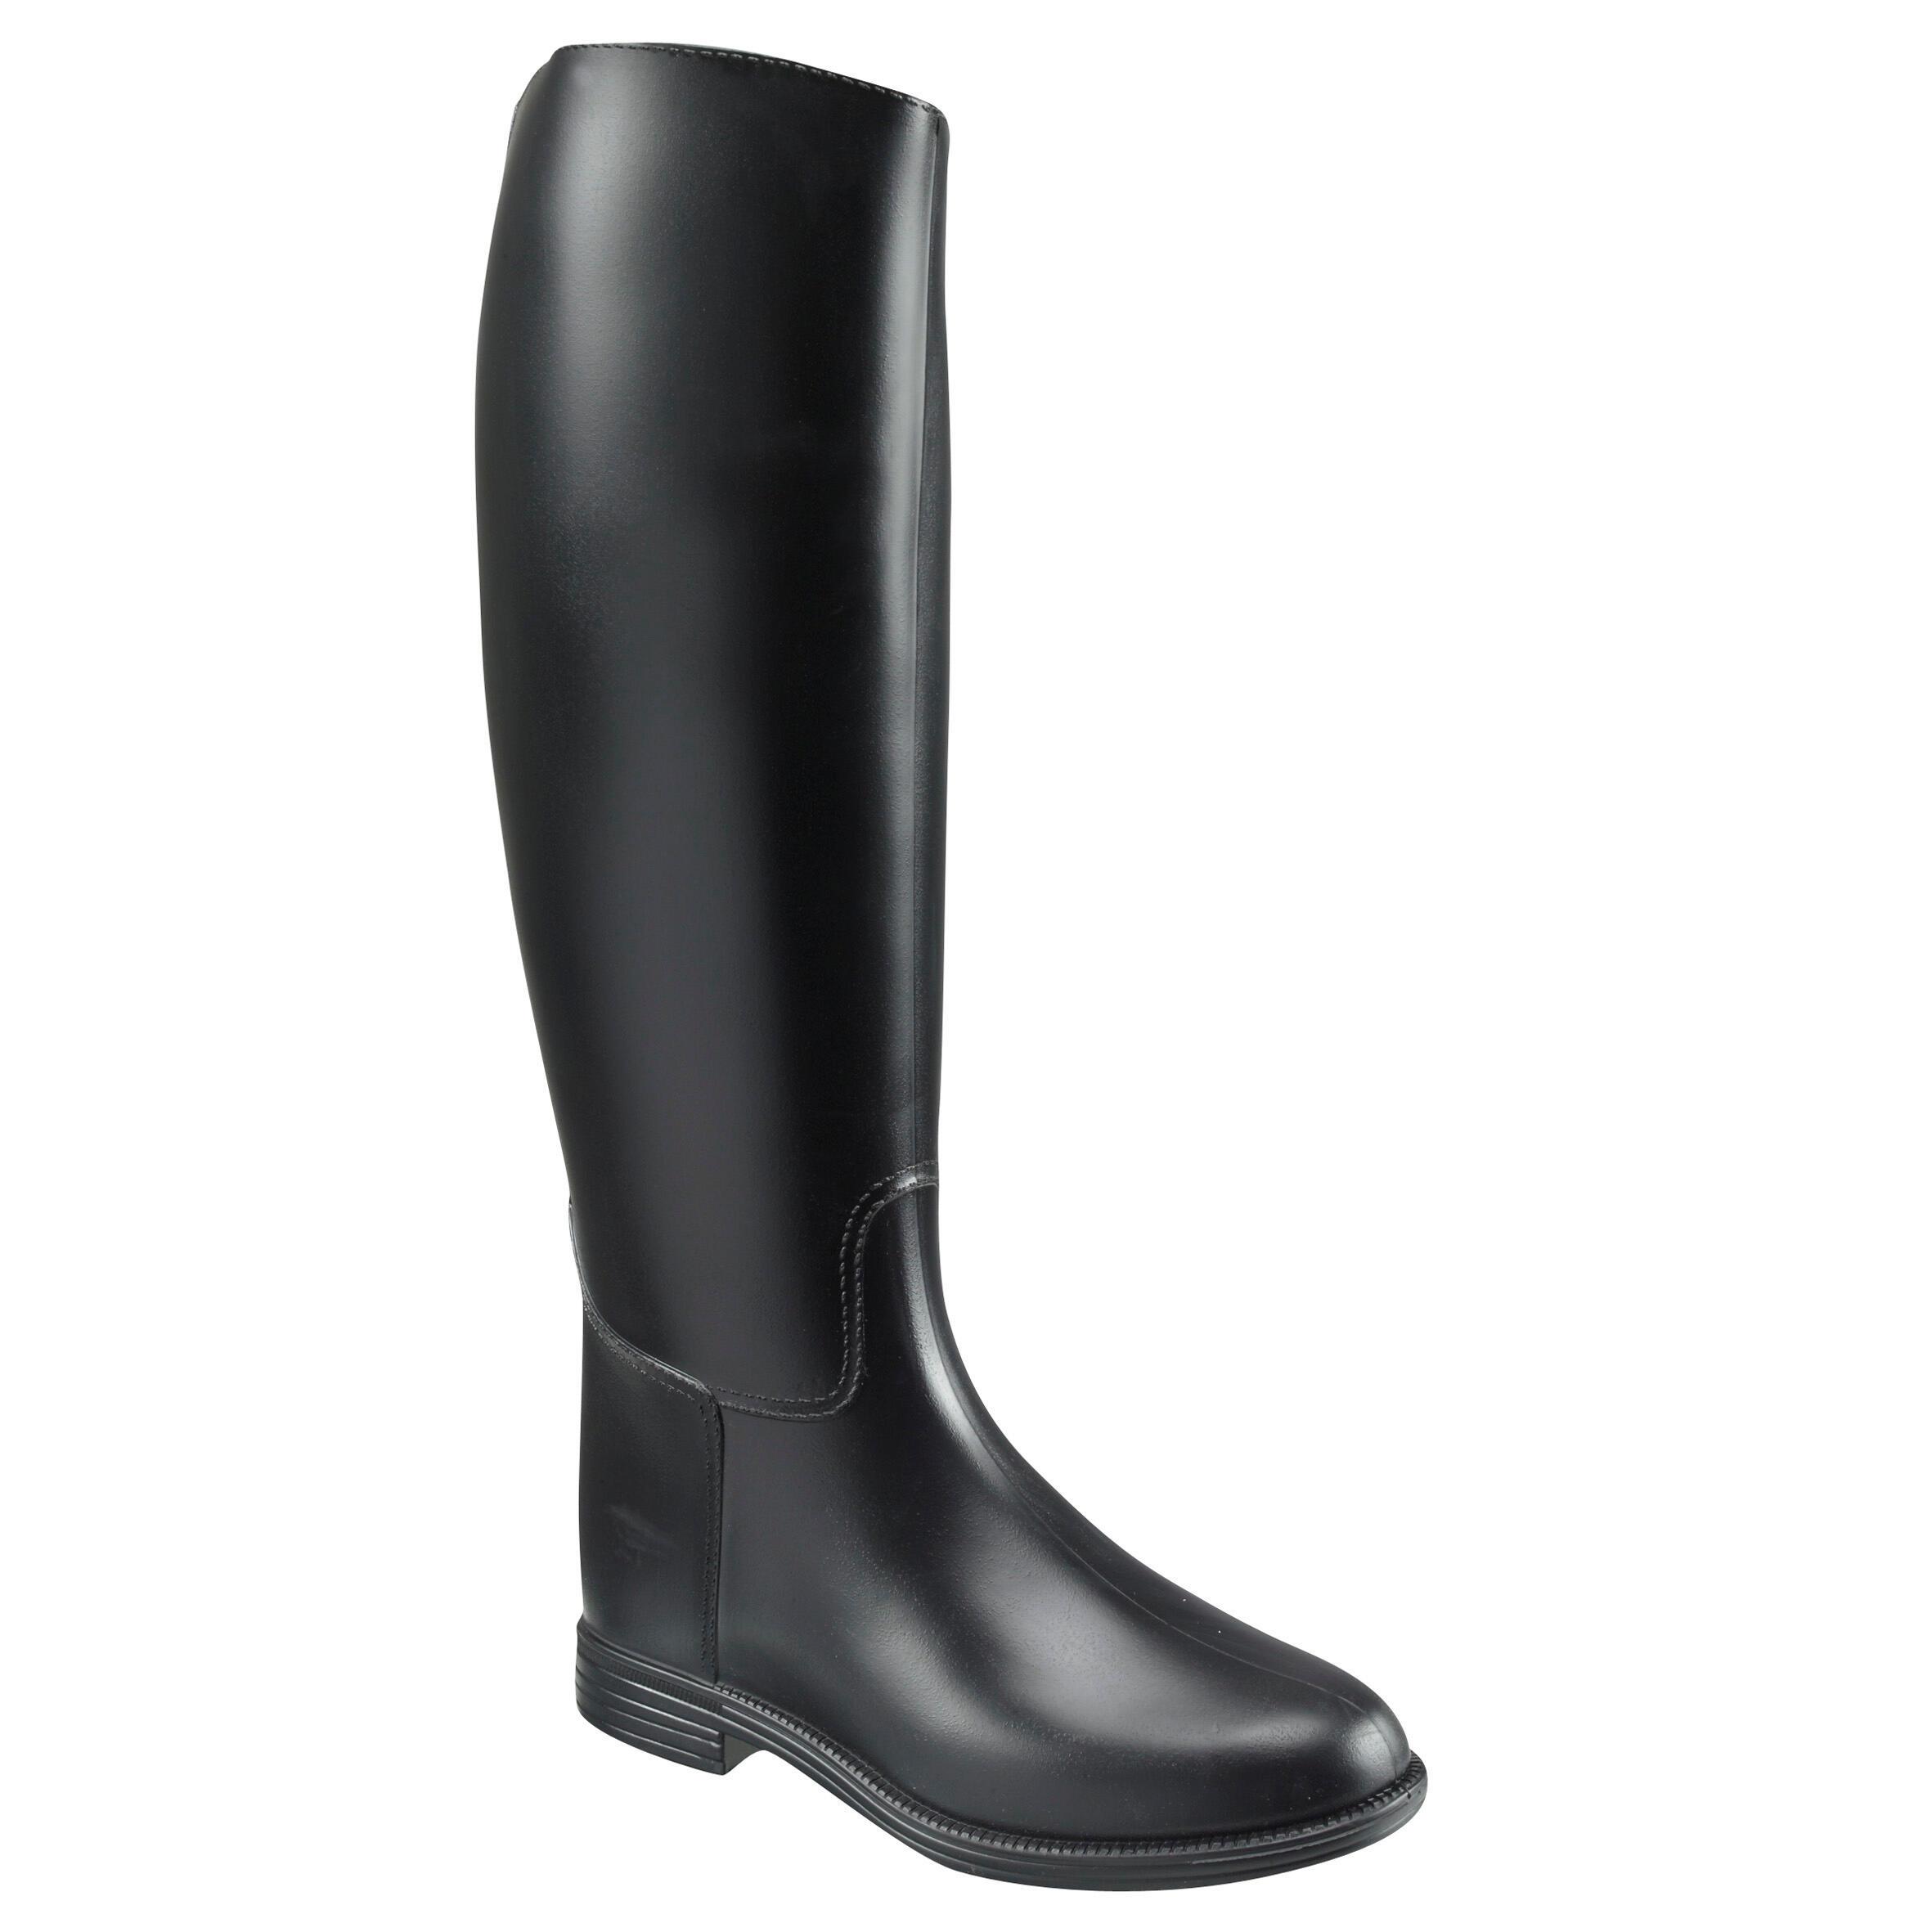 Botas equitación adulto SCHOOLING negro - tallas 21.5 a 28.5